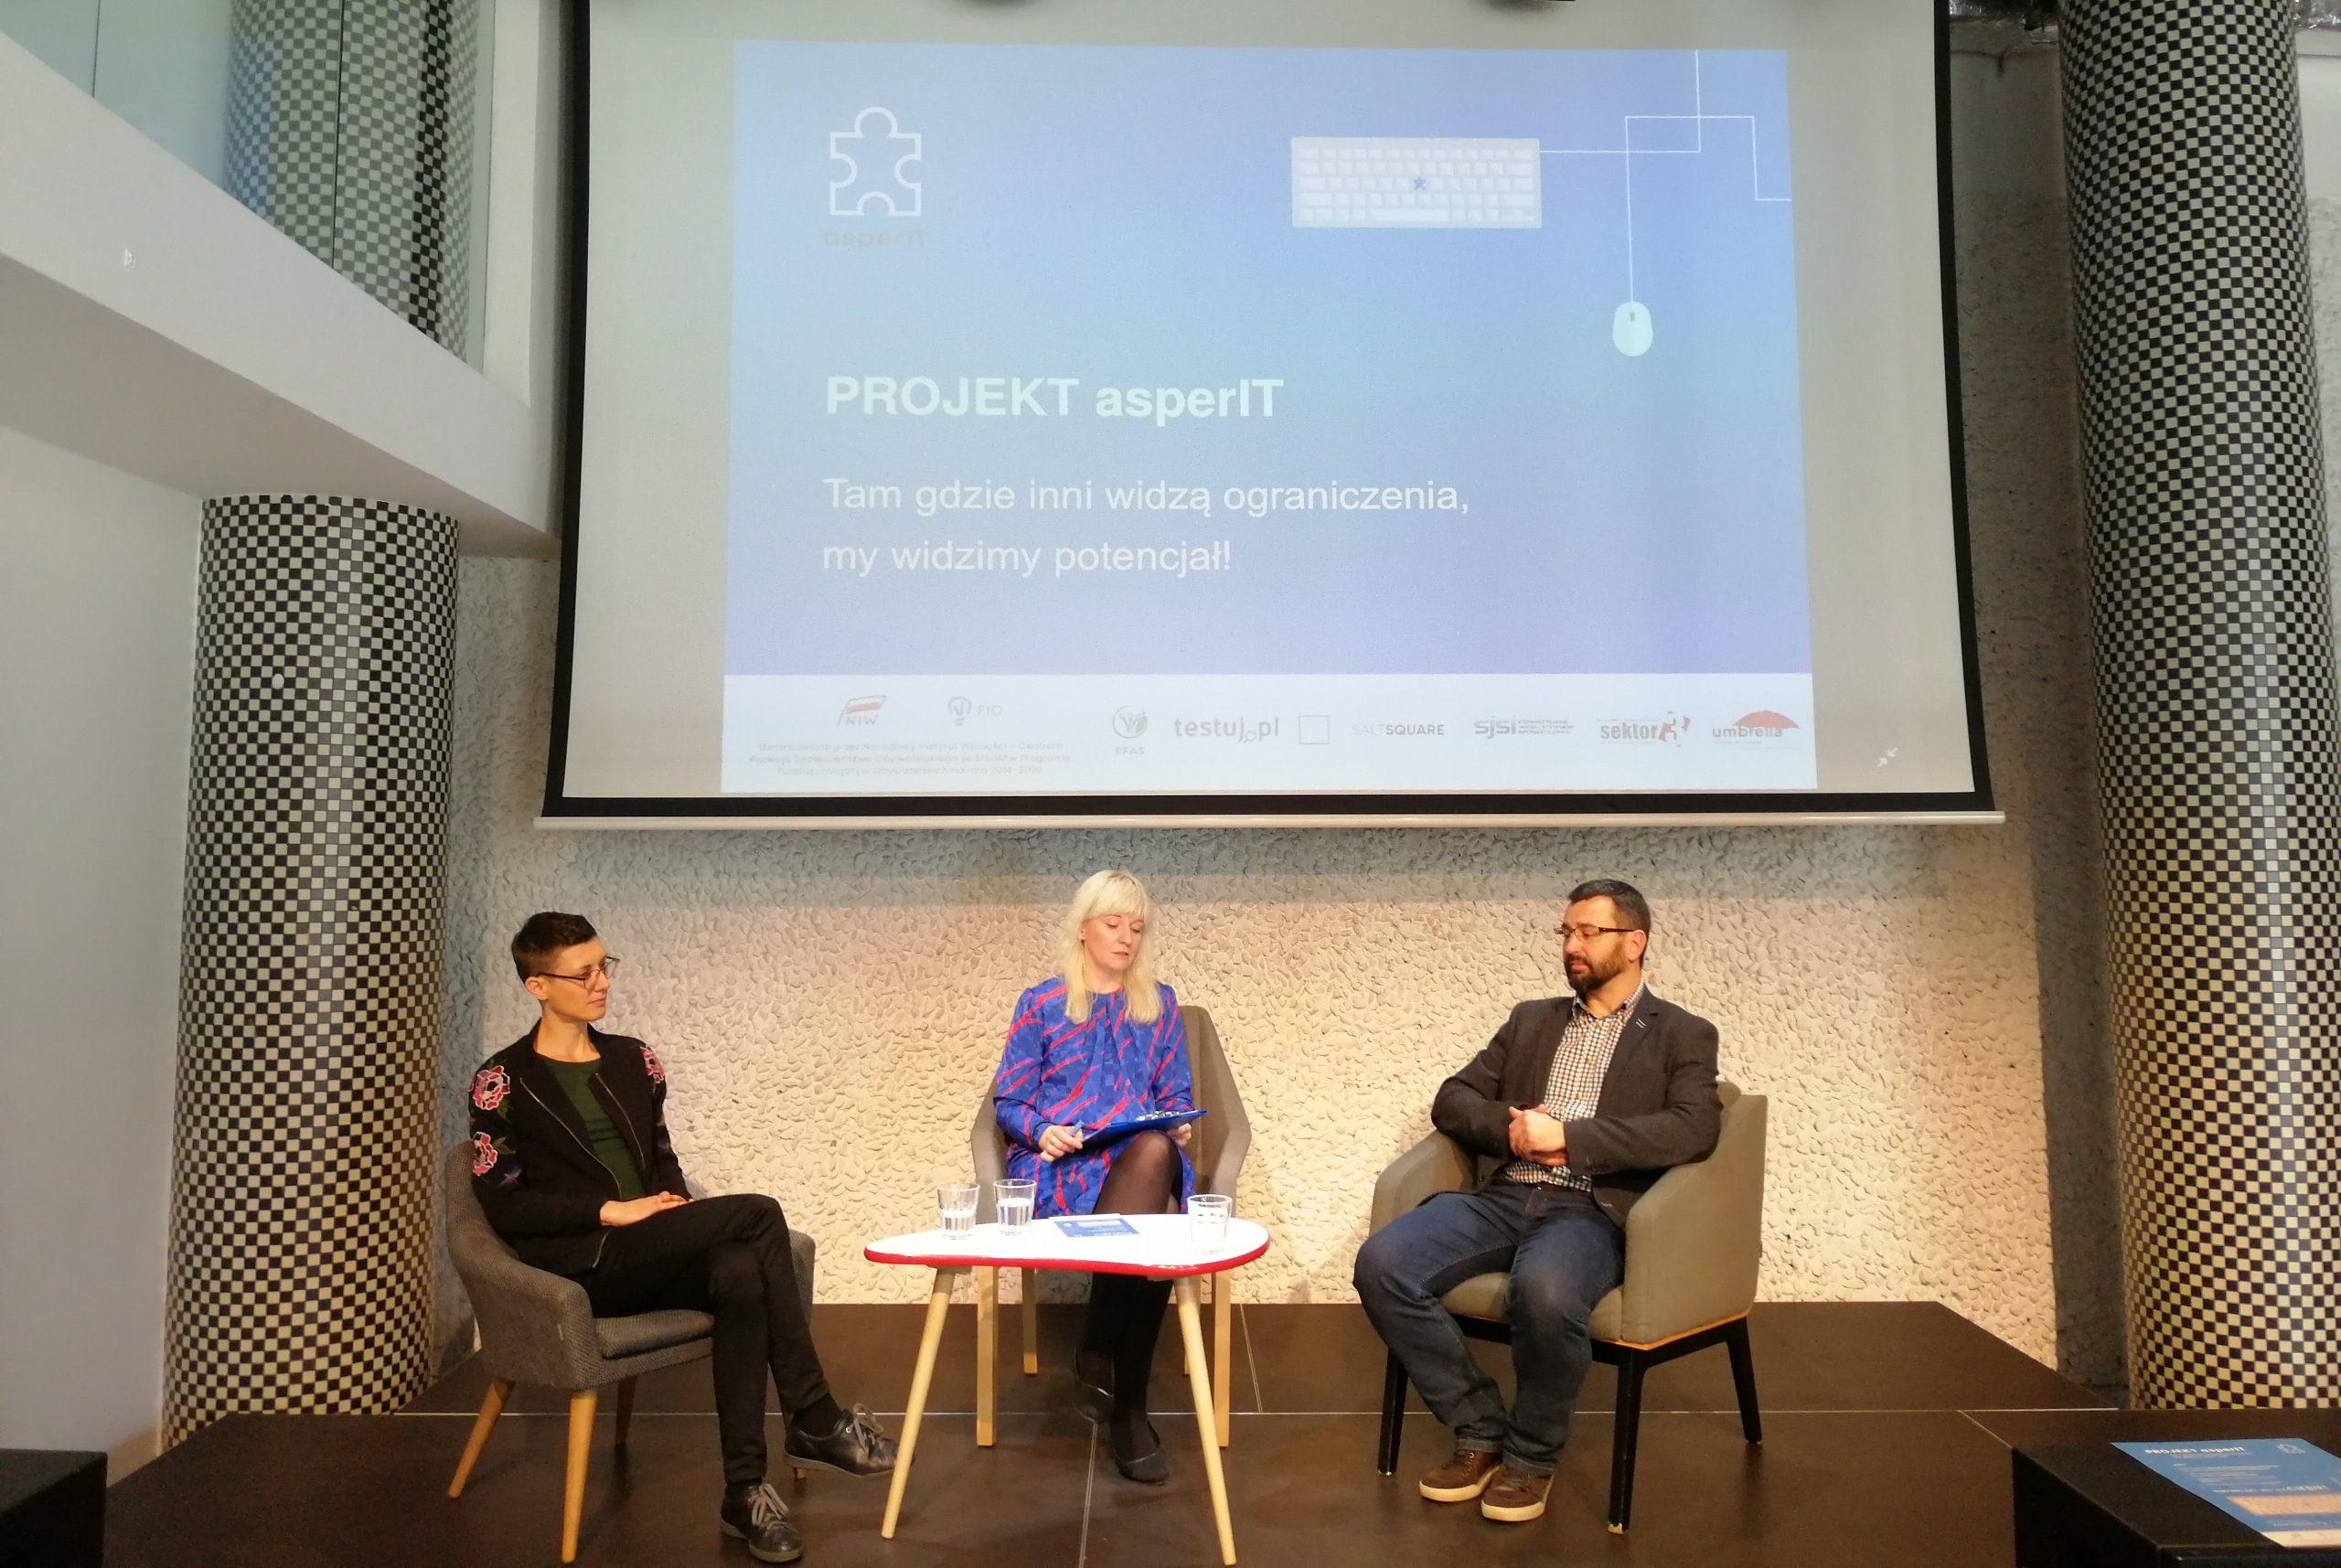 asperIT press conference – inauguration of the second edition